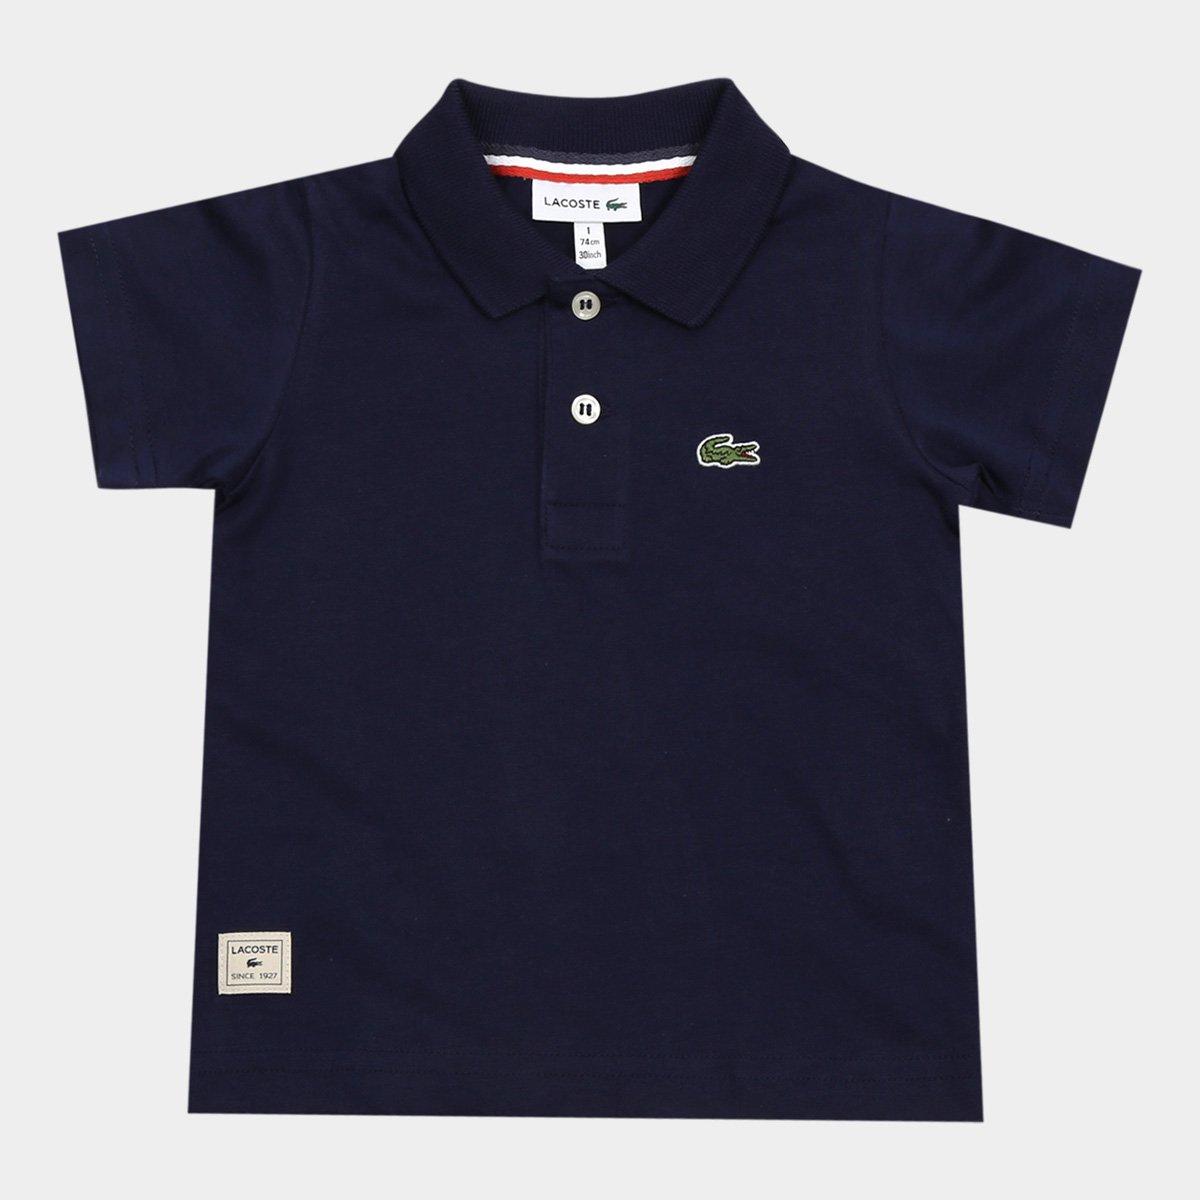 2ff85d59a8d2b Camisa Polo Infantil Lacoste Masculina - Compre Agora